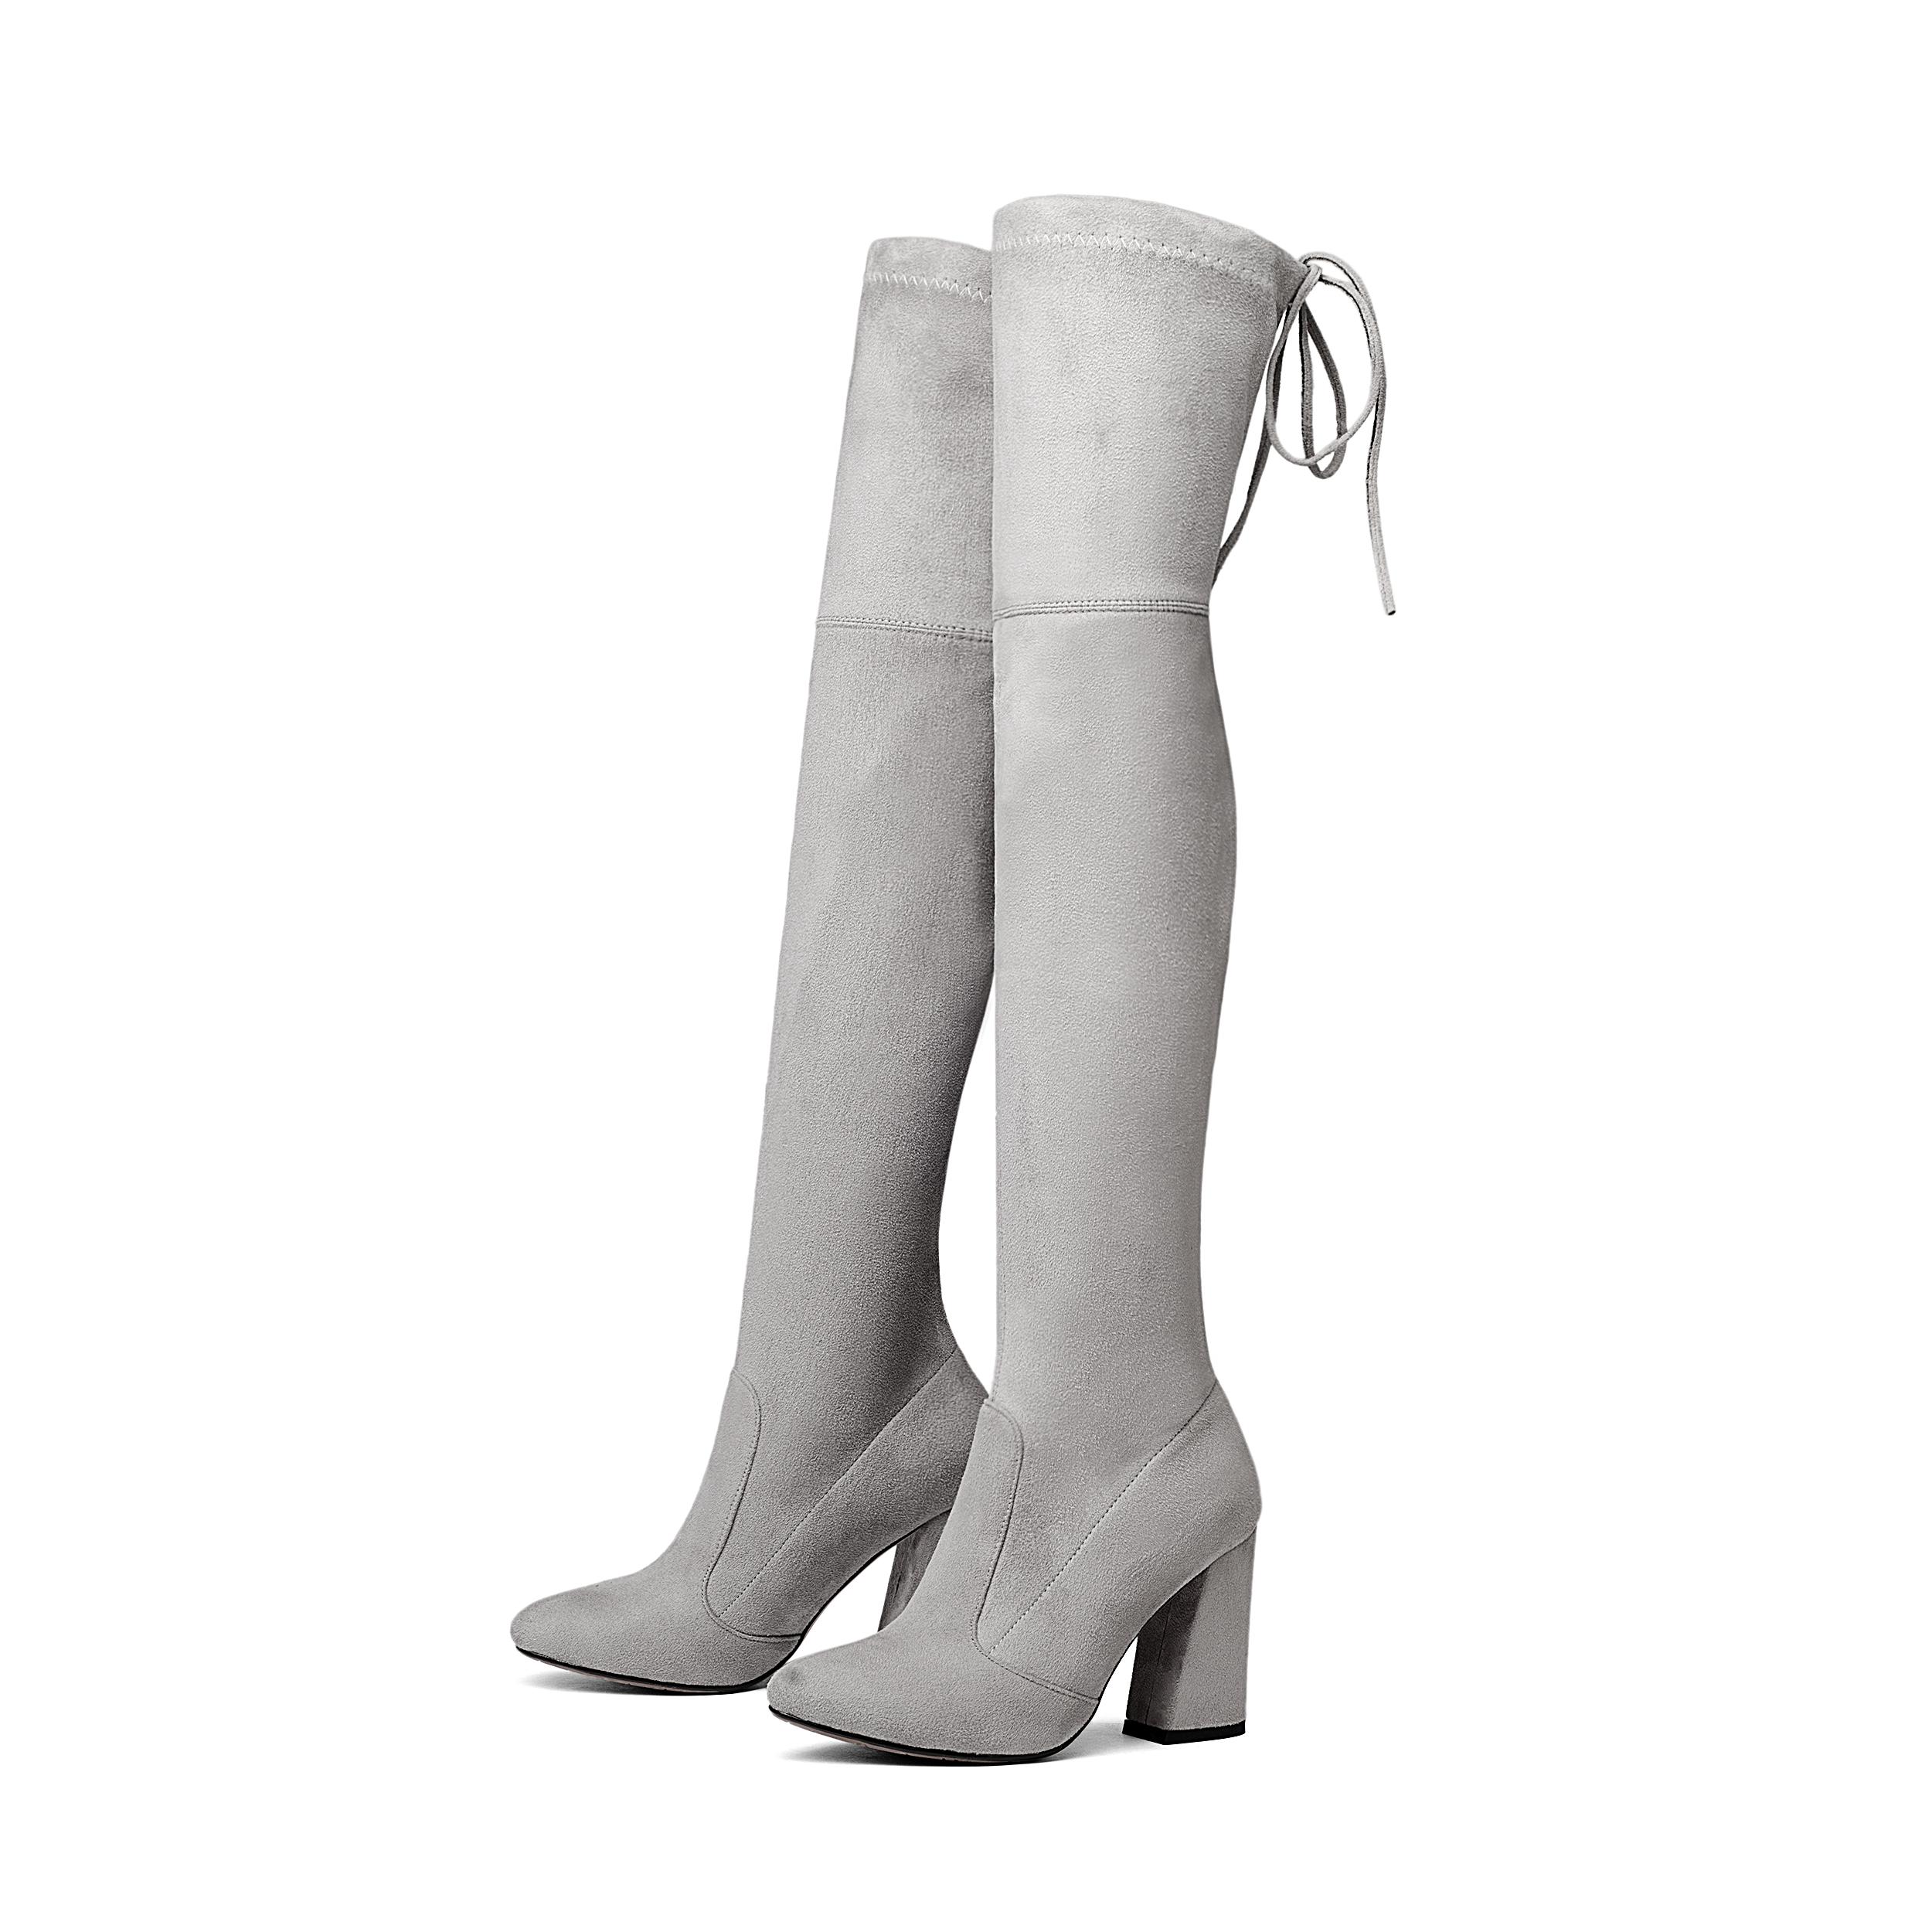 0a4a0f2211 US $27.89 45% OFF NEMAONE Vrouwen Stretch Suede Over de Knie Laarzen Dij  Hoge Laarzen Sexy Mode Plus Size Hoge Hakken Schoenen Vrouw 2017 Bruin in  ...